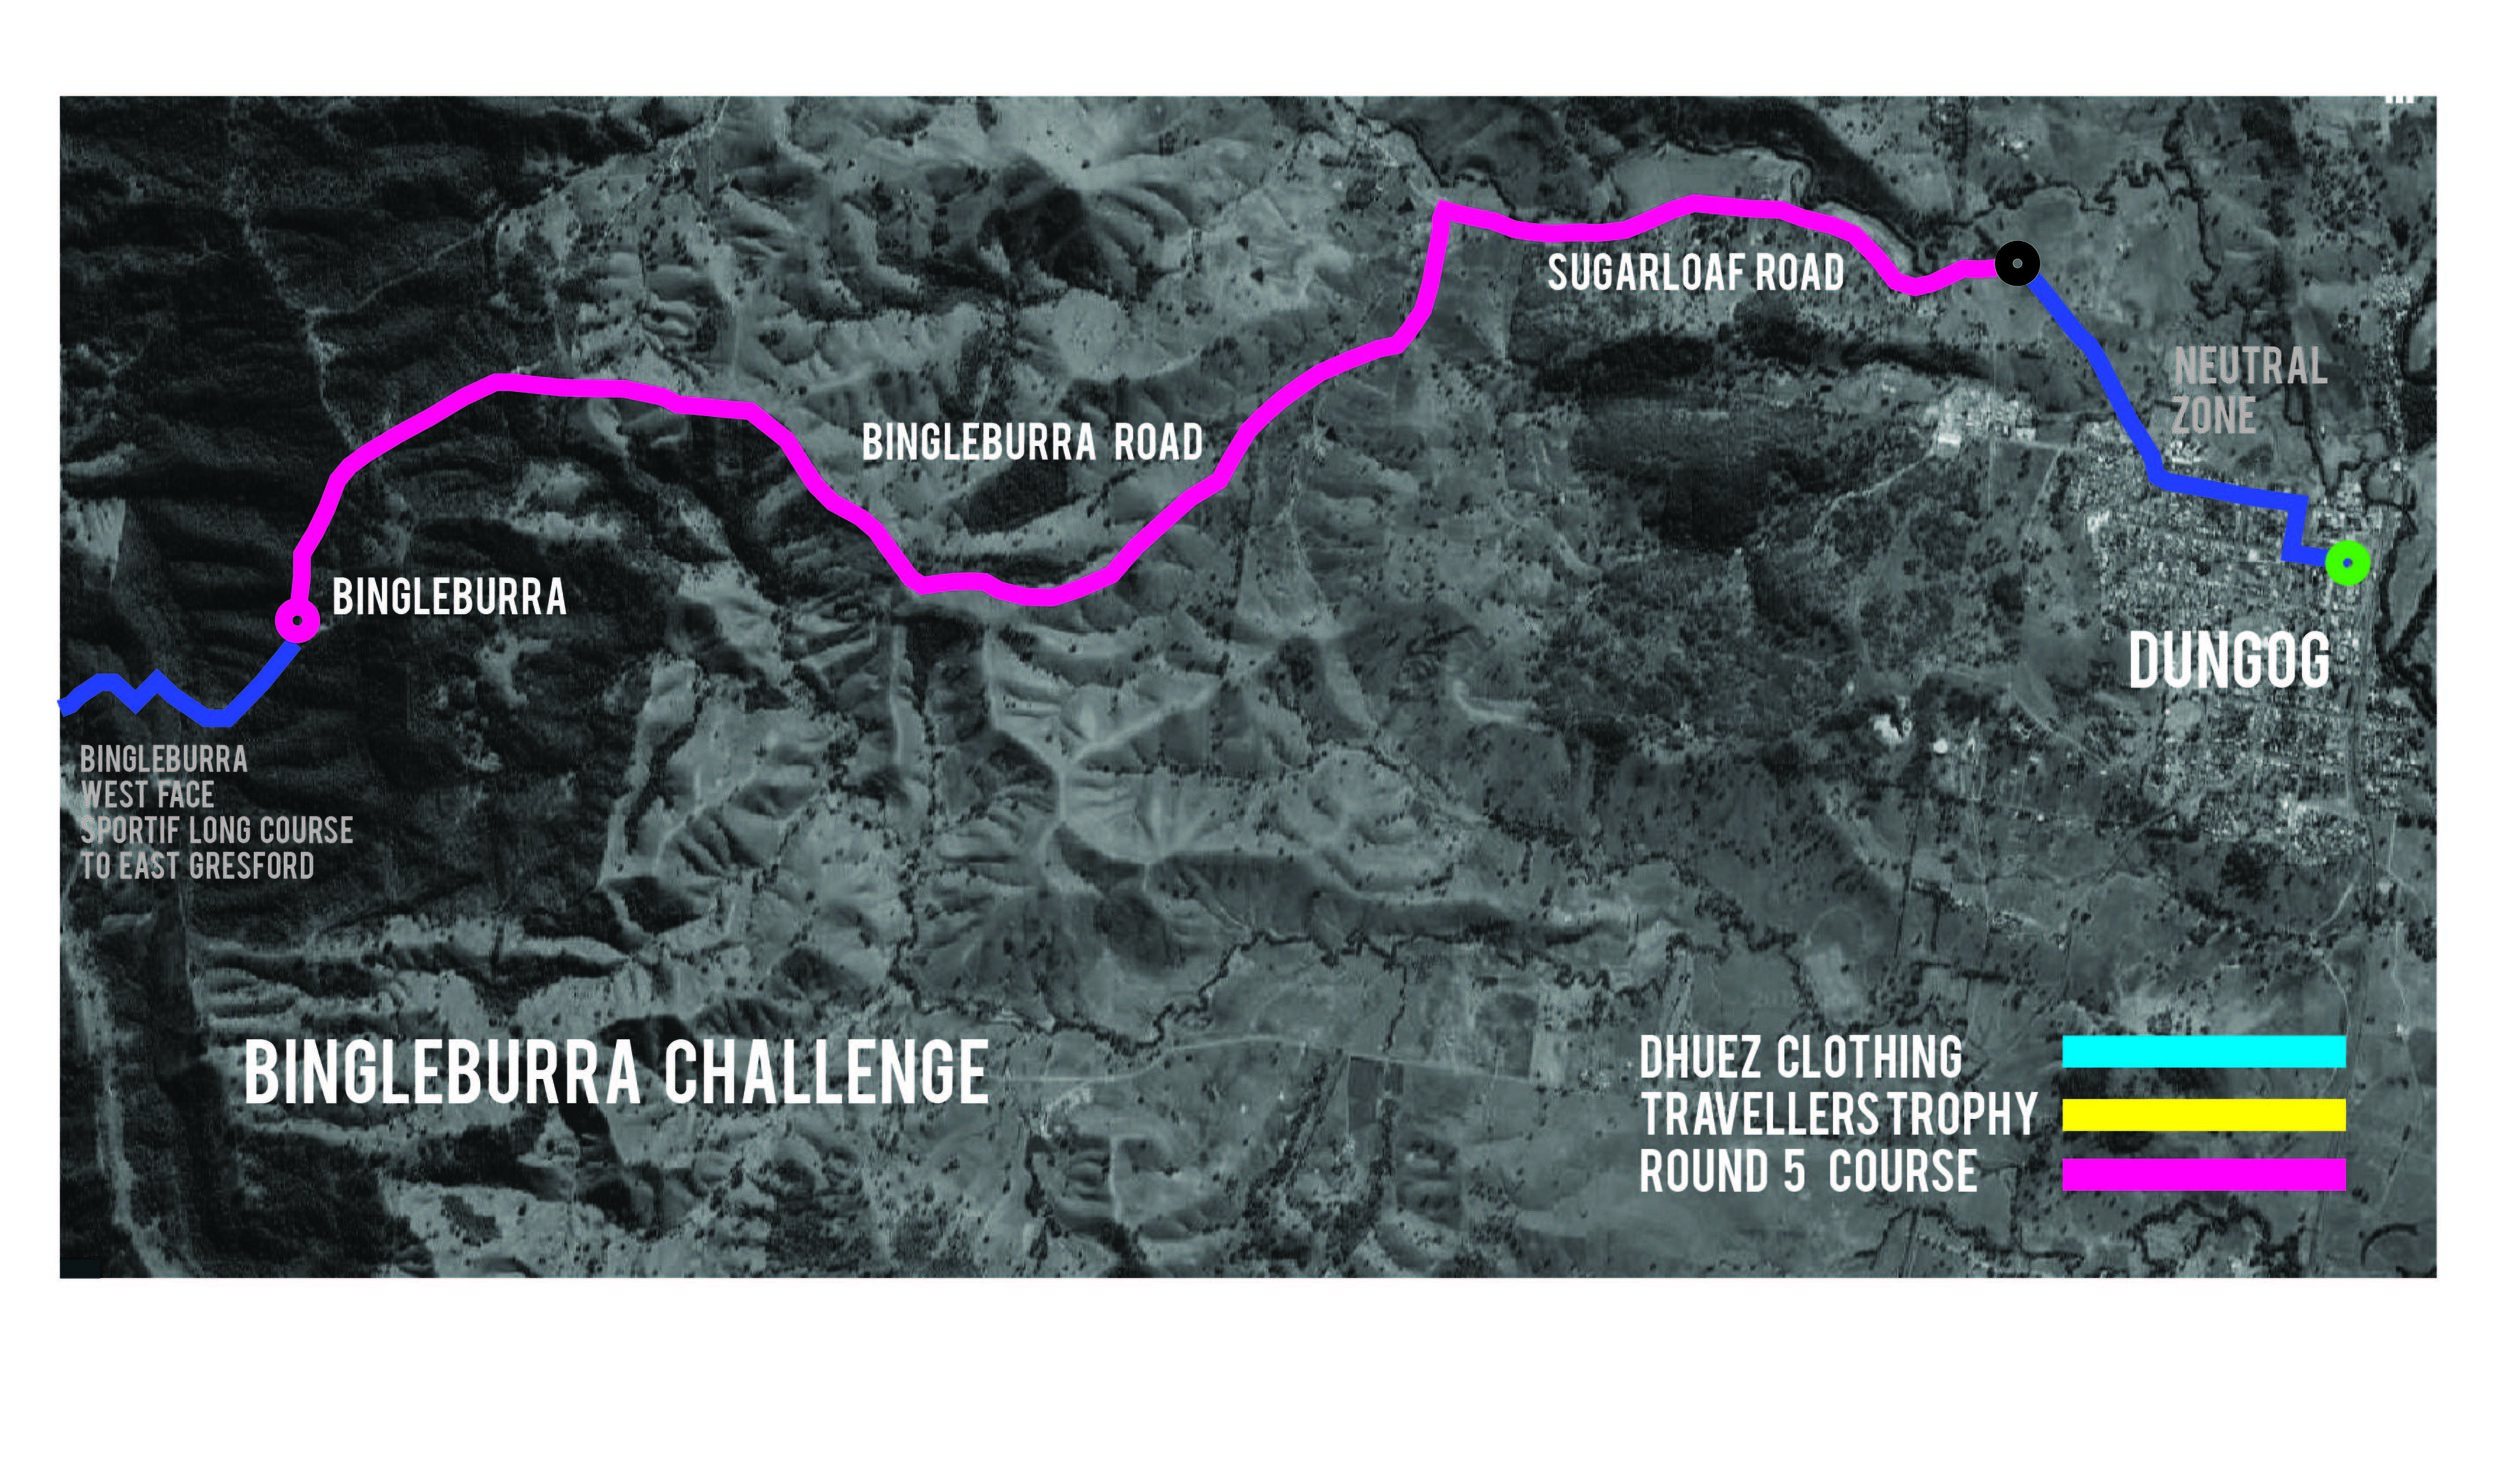 Bingleburra Challenge Map.jpg